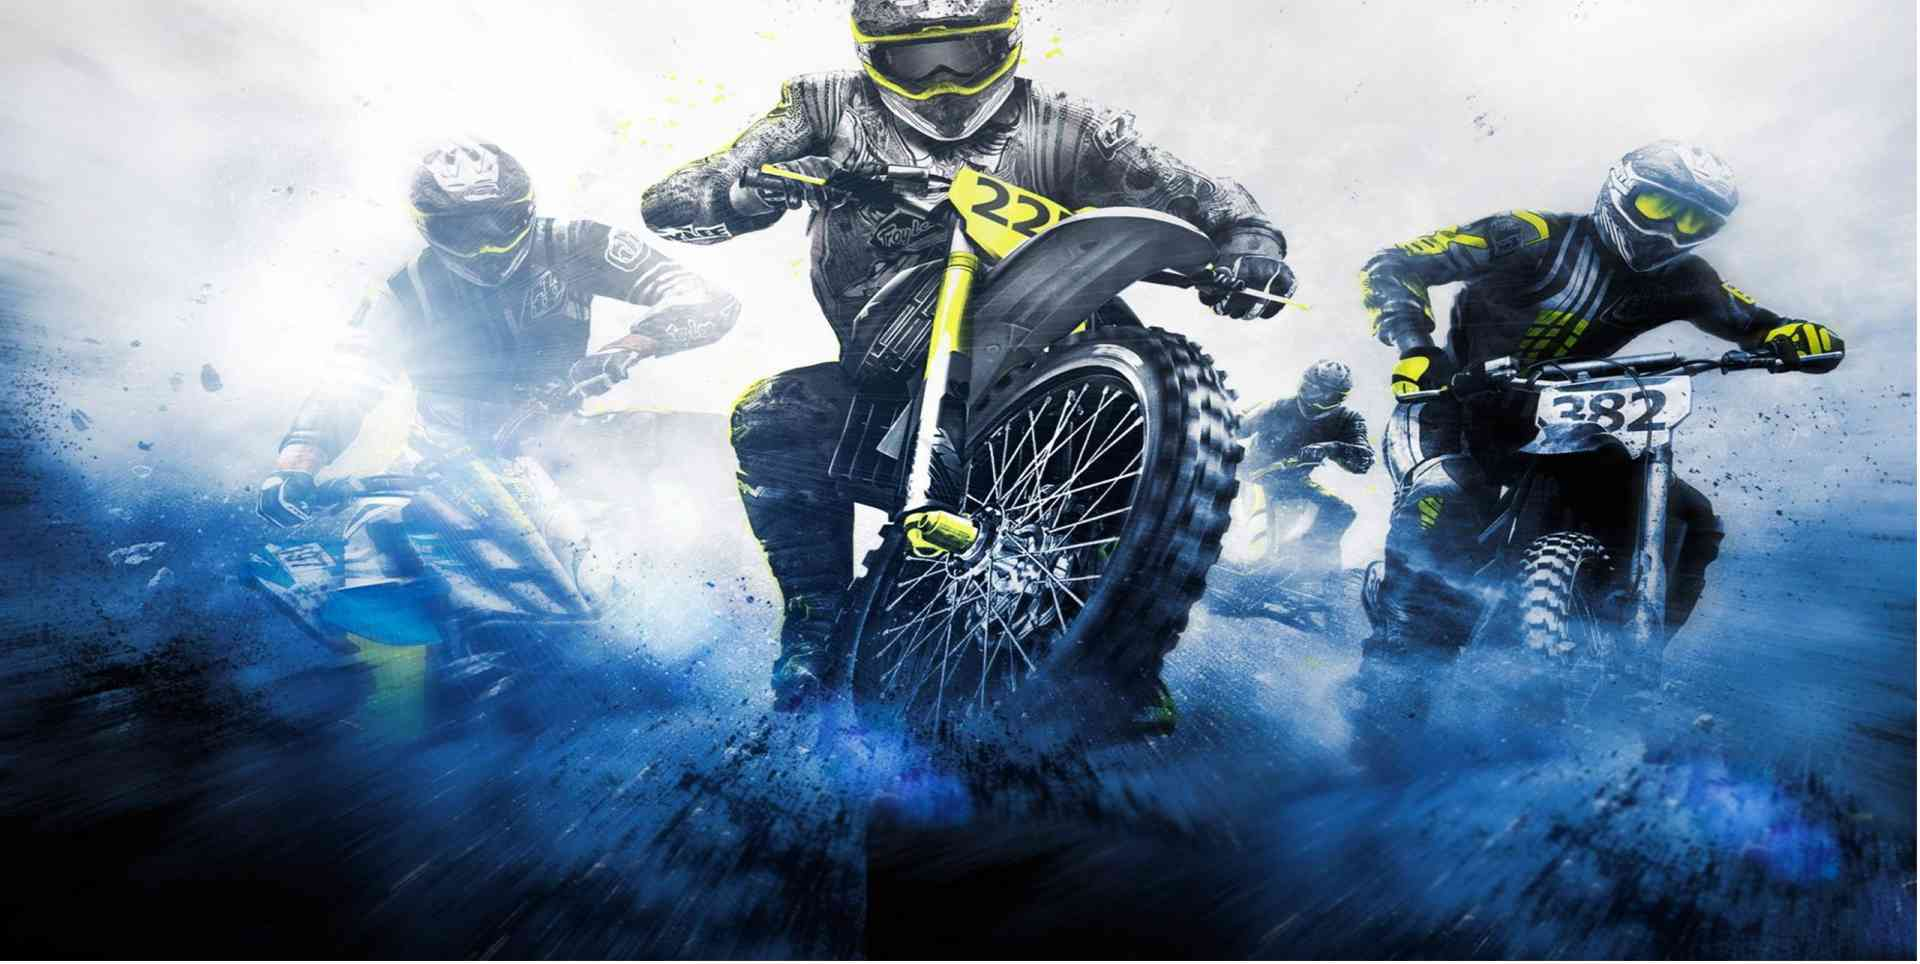 watch-southwick-national-motocross-live